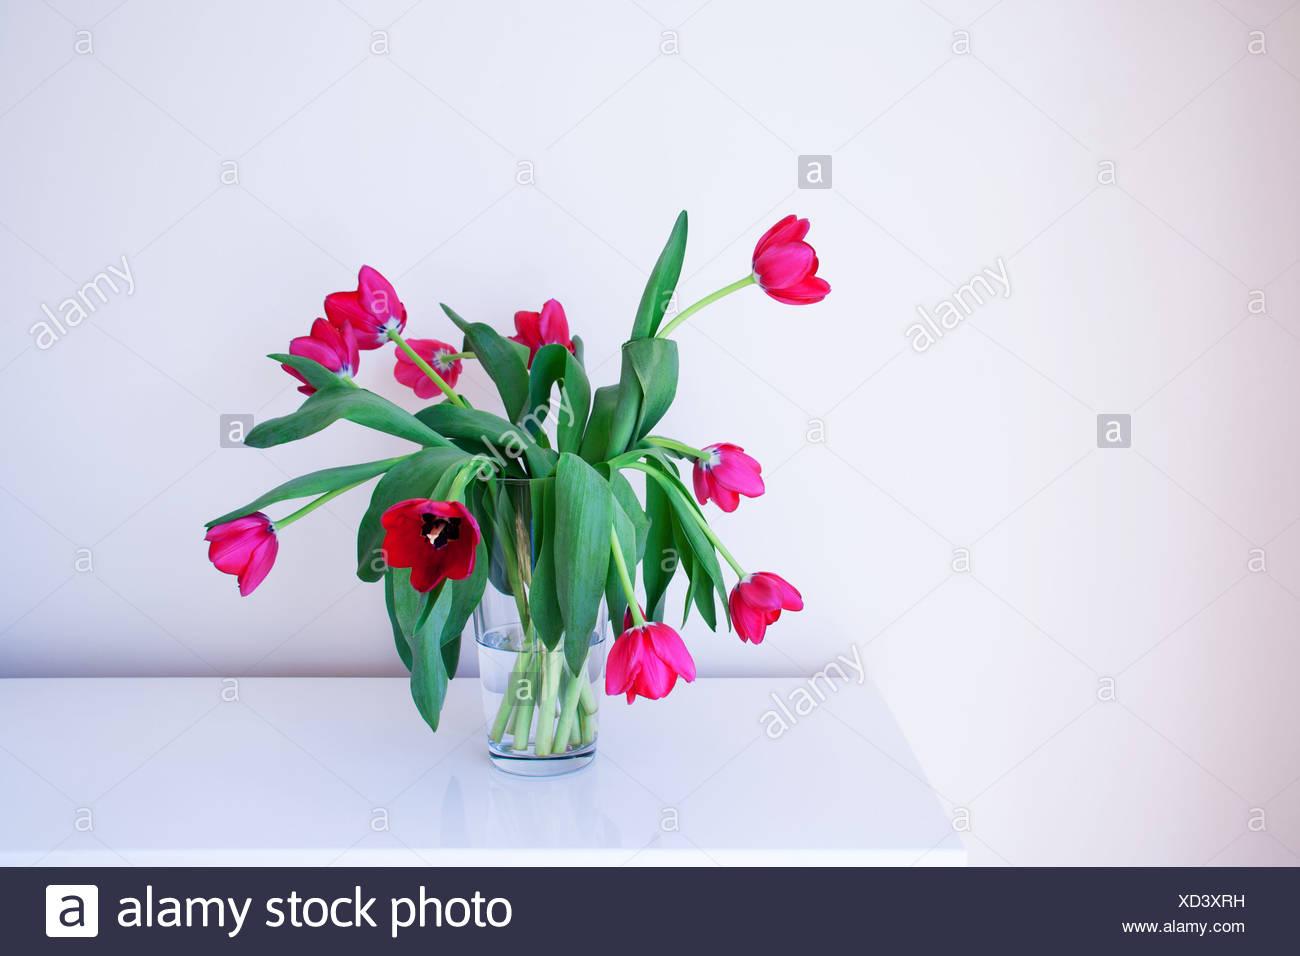 Tulips in glass vase stock photos tulips in glass vase stock pink tulips in glass vase stock image reviewsmspy